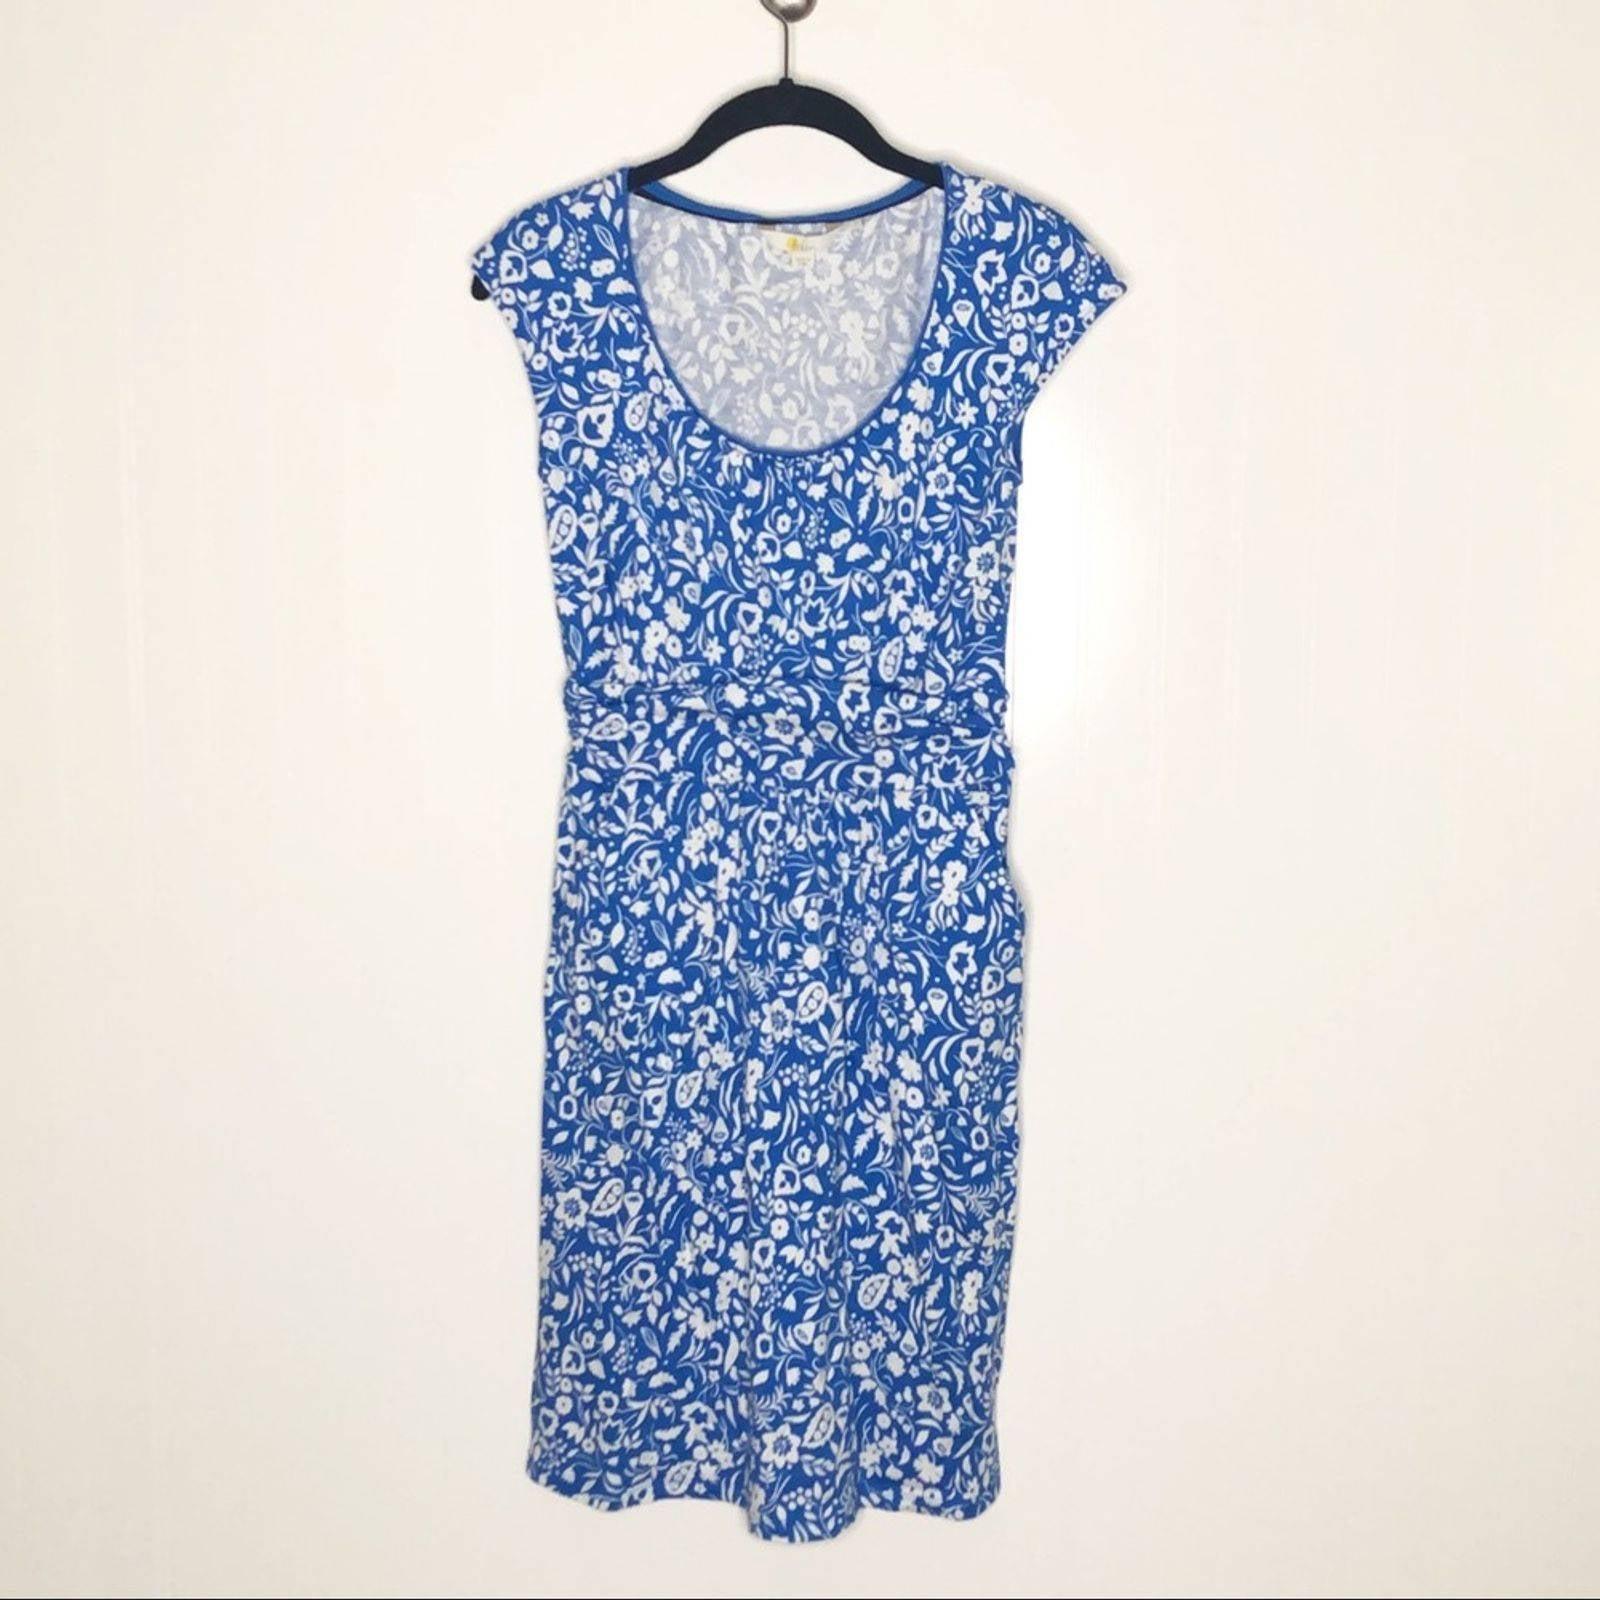 BODEN Margot Jersey Blue/White Dress